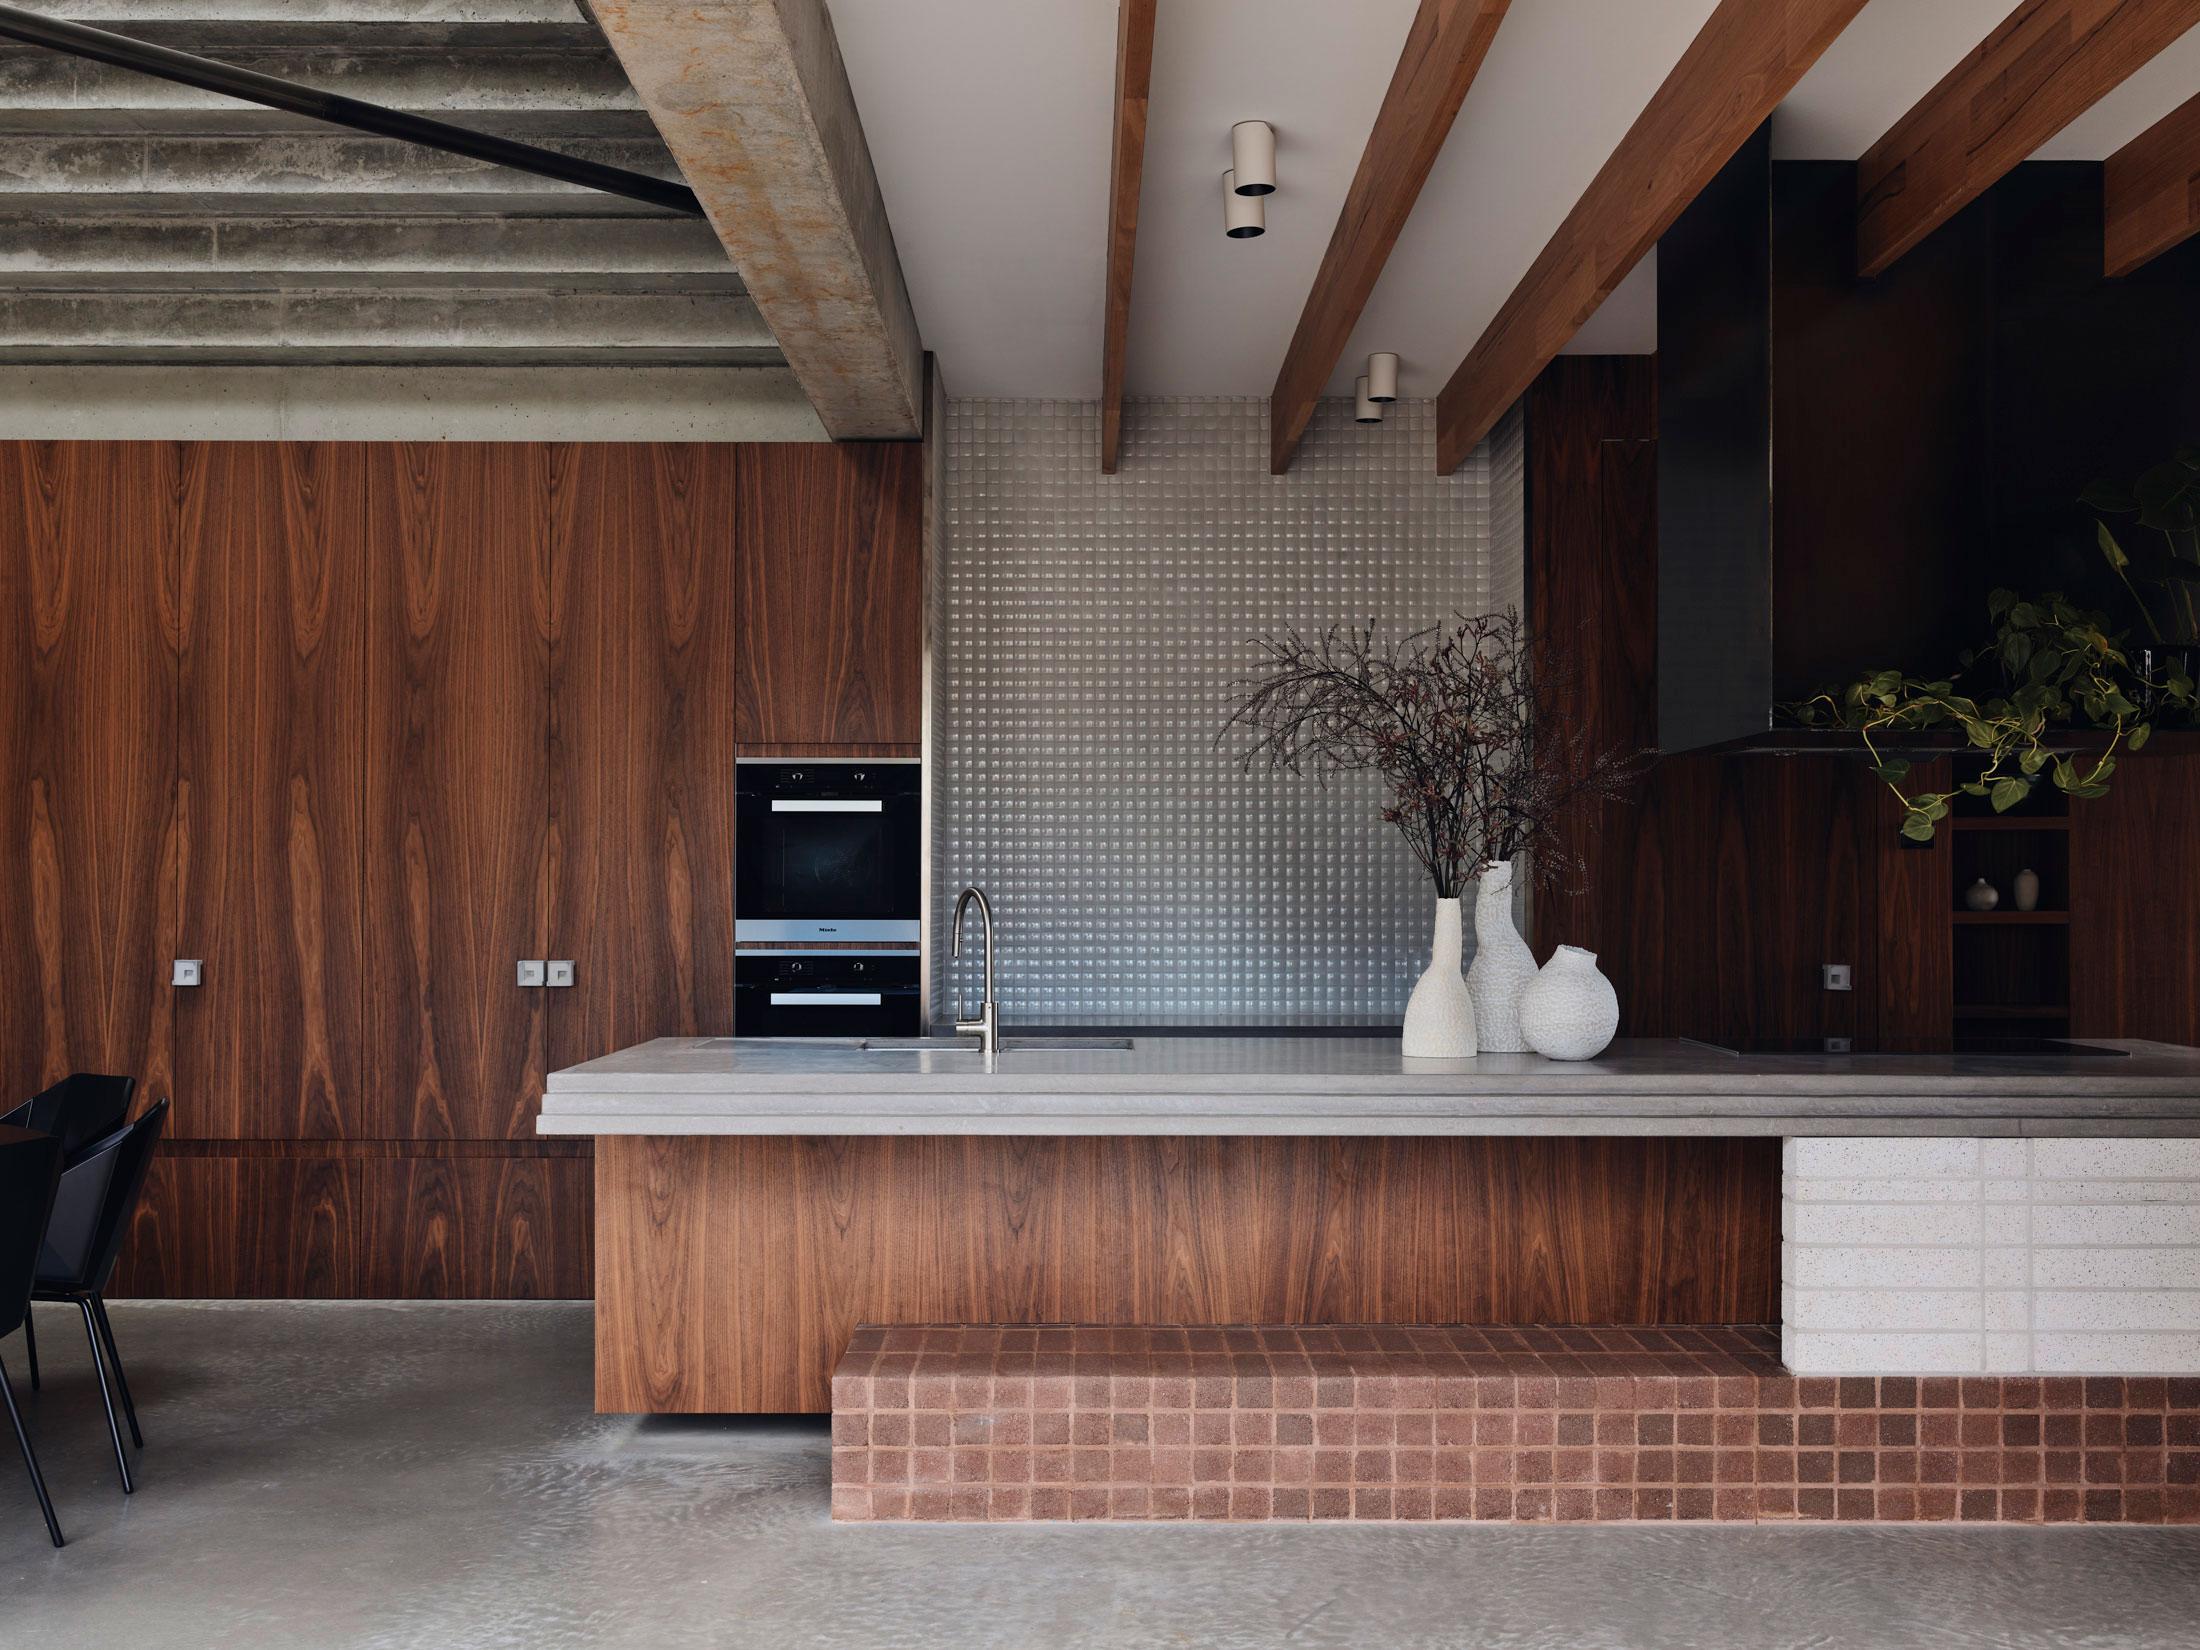 Architects Eat Bellows Beach House Flinders Masonry Architecture Photo Derek Swalwell Yellowtrace 31